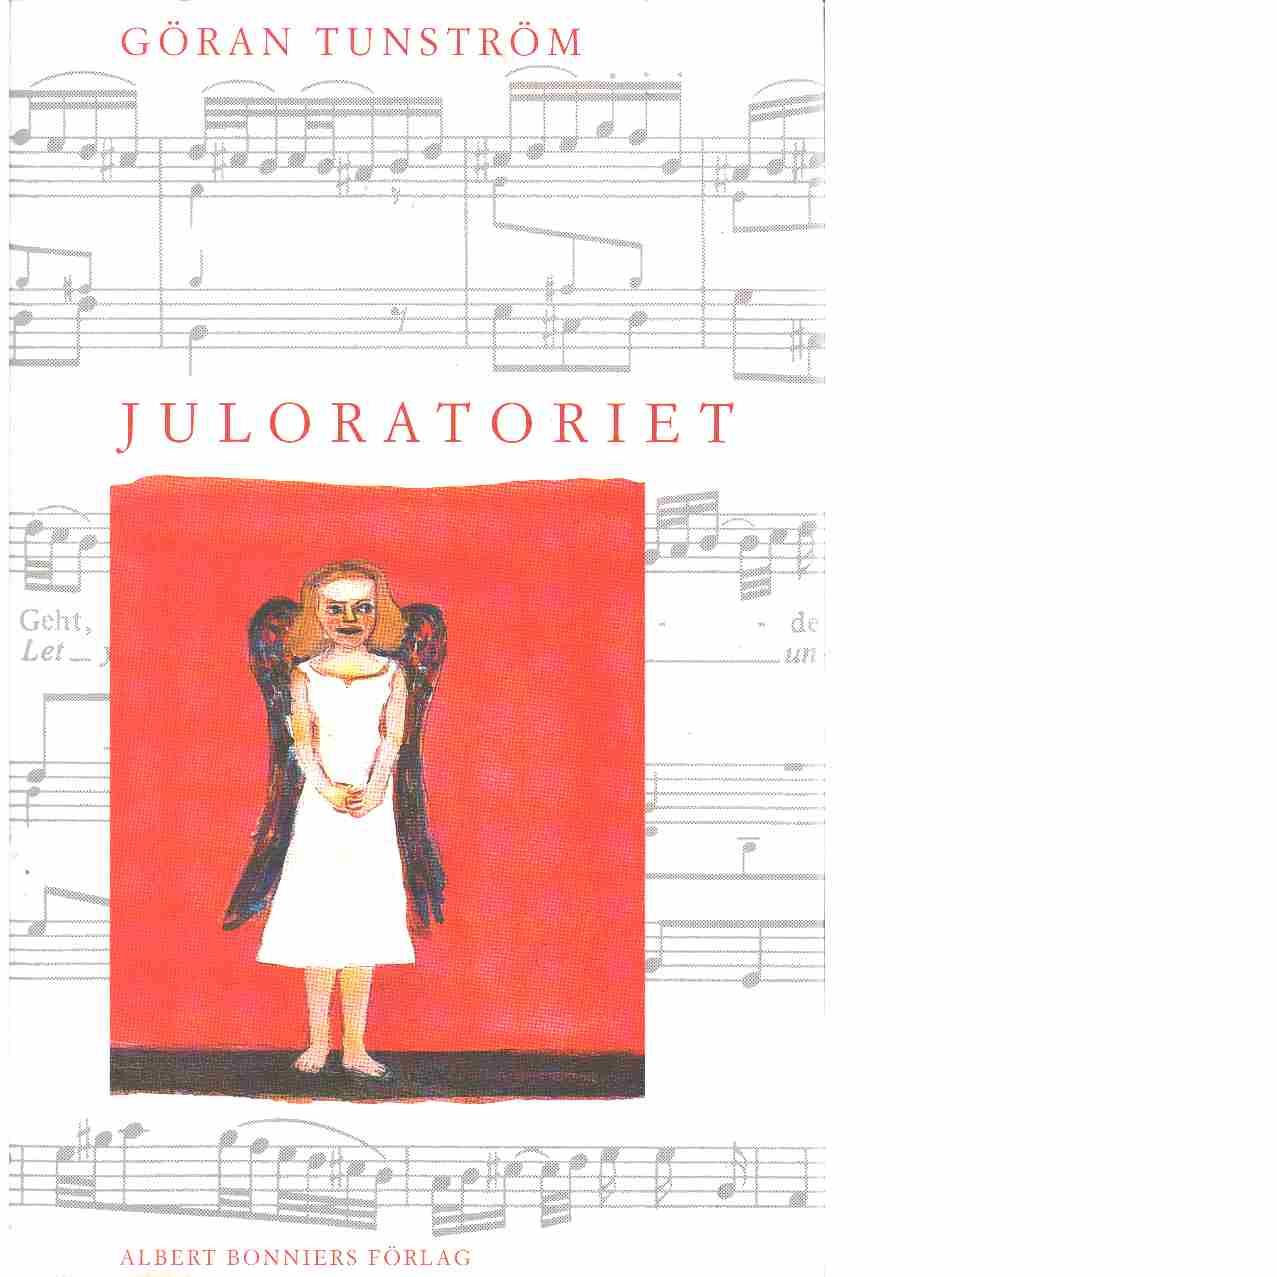 Juloratoriet  - Tunström, Göran